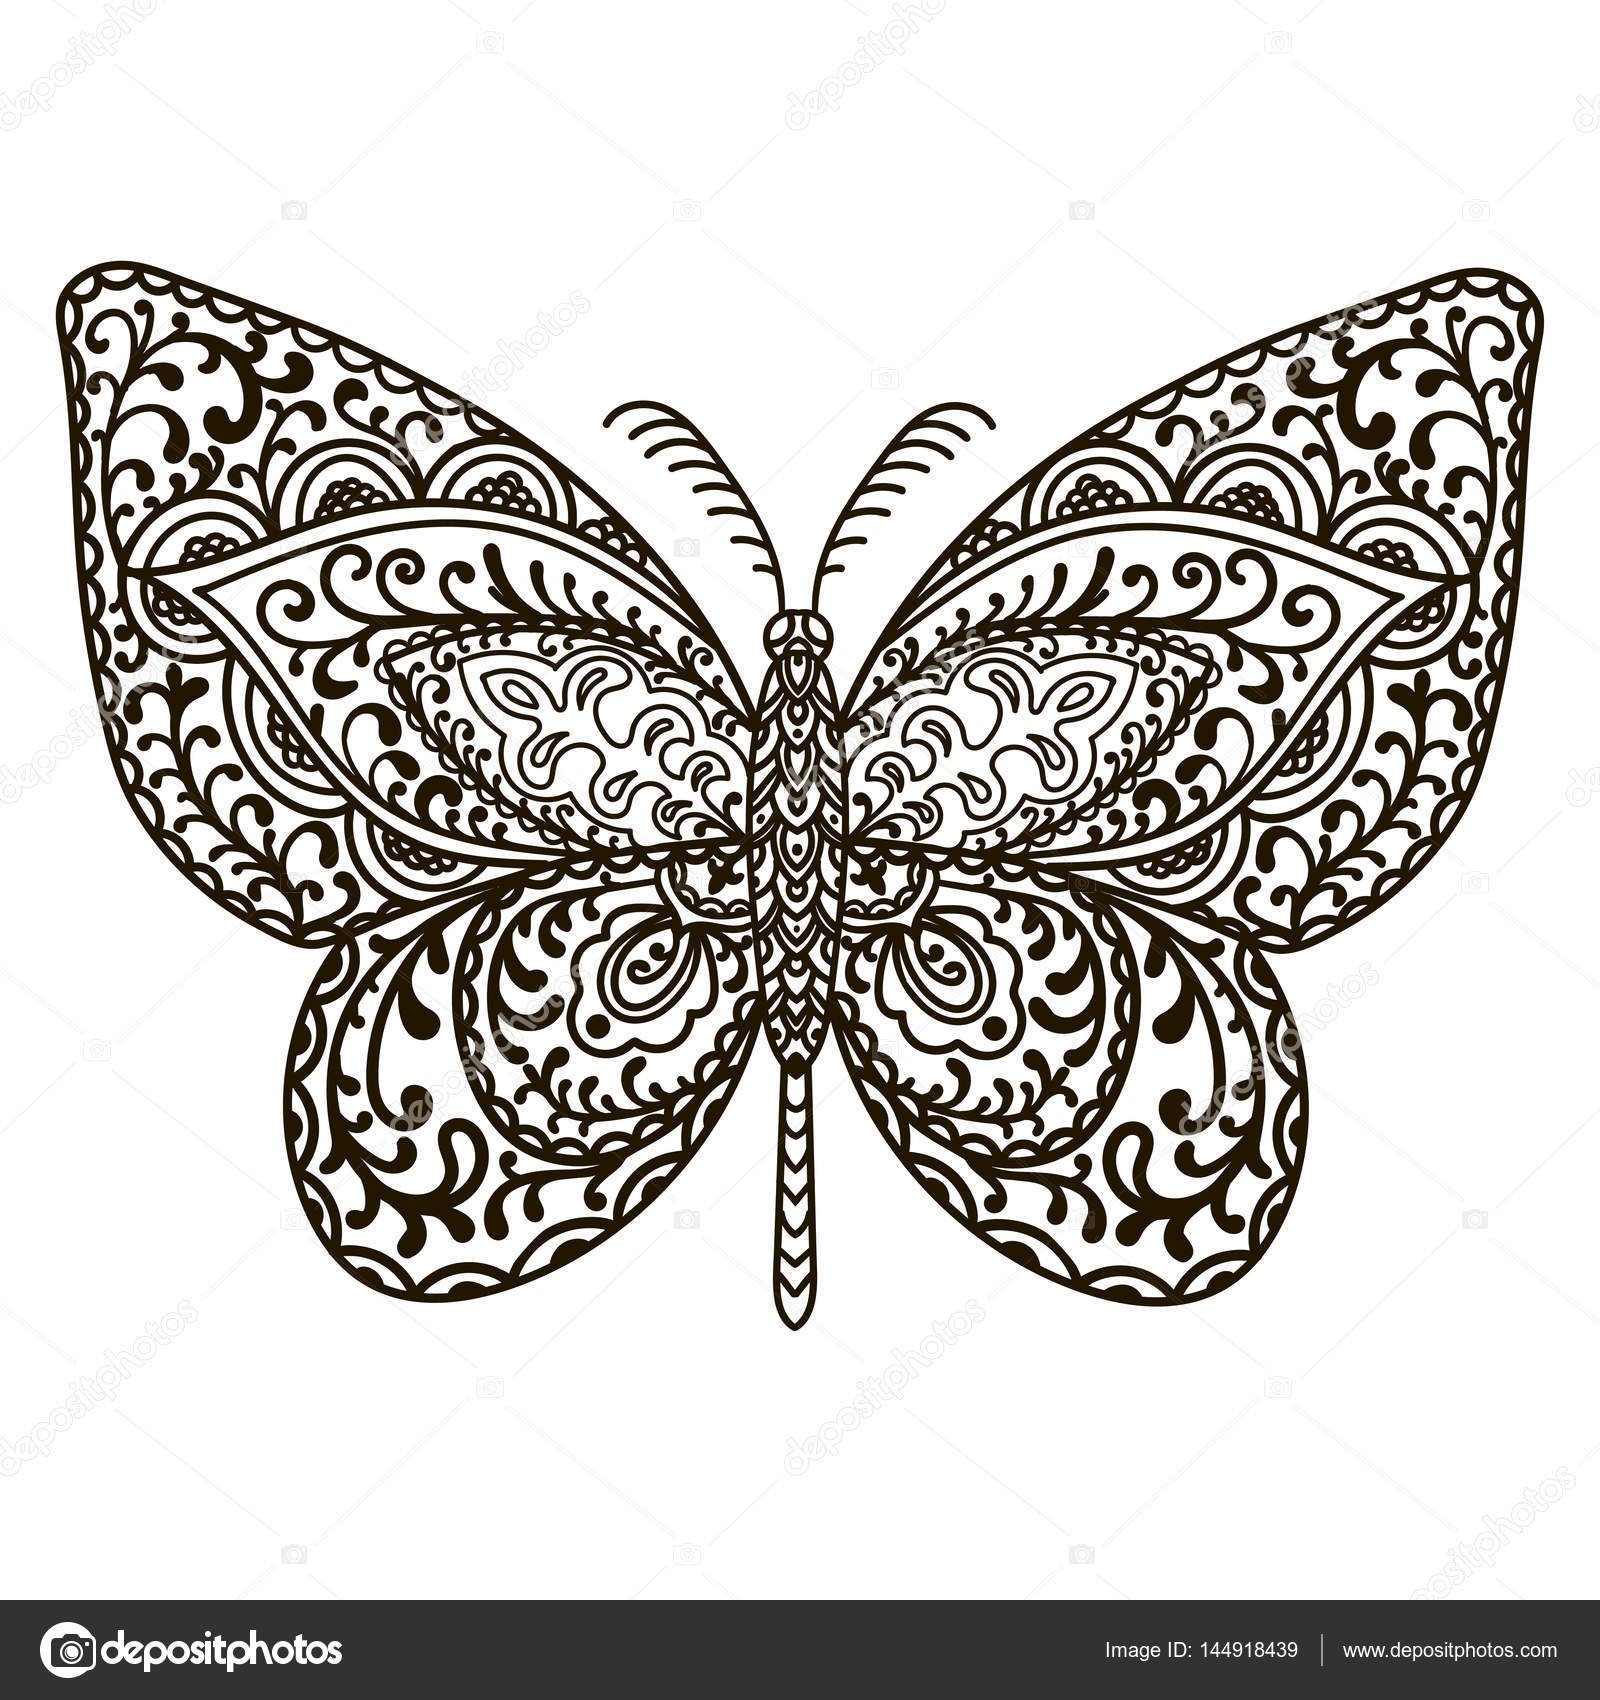 Drawn butterfly totem Totem Animals illustration doodle doodle